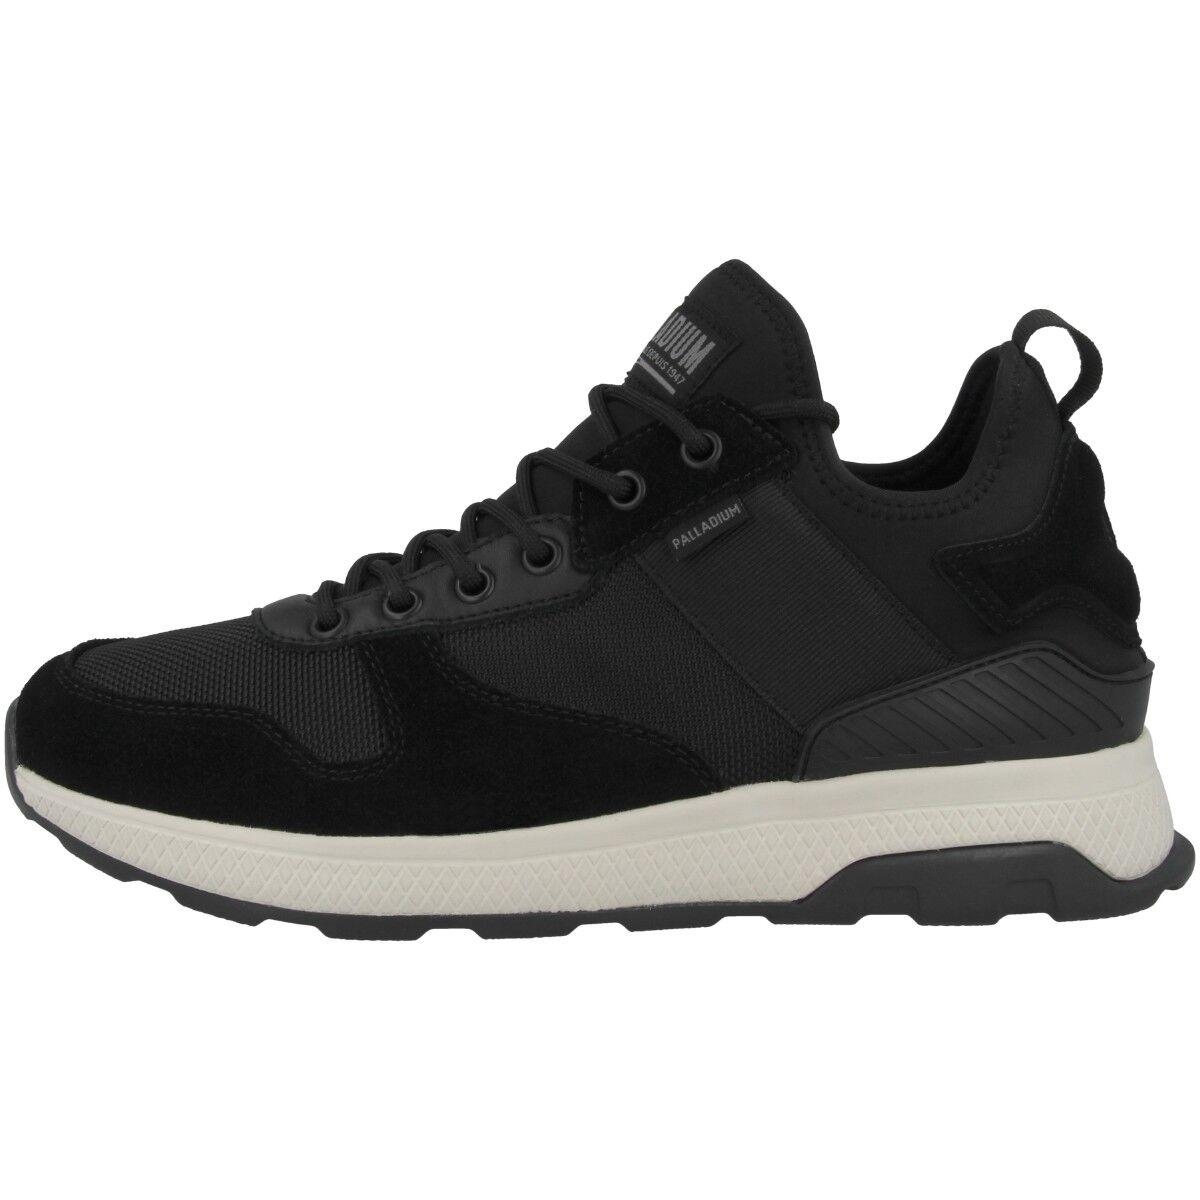 Palladium Ax _ Eon Esercito Runner Scarpe Uomo Casual Sport Sneakers Black